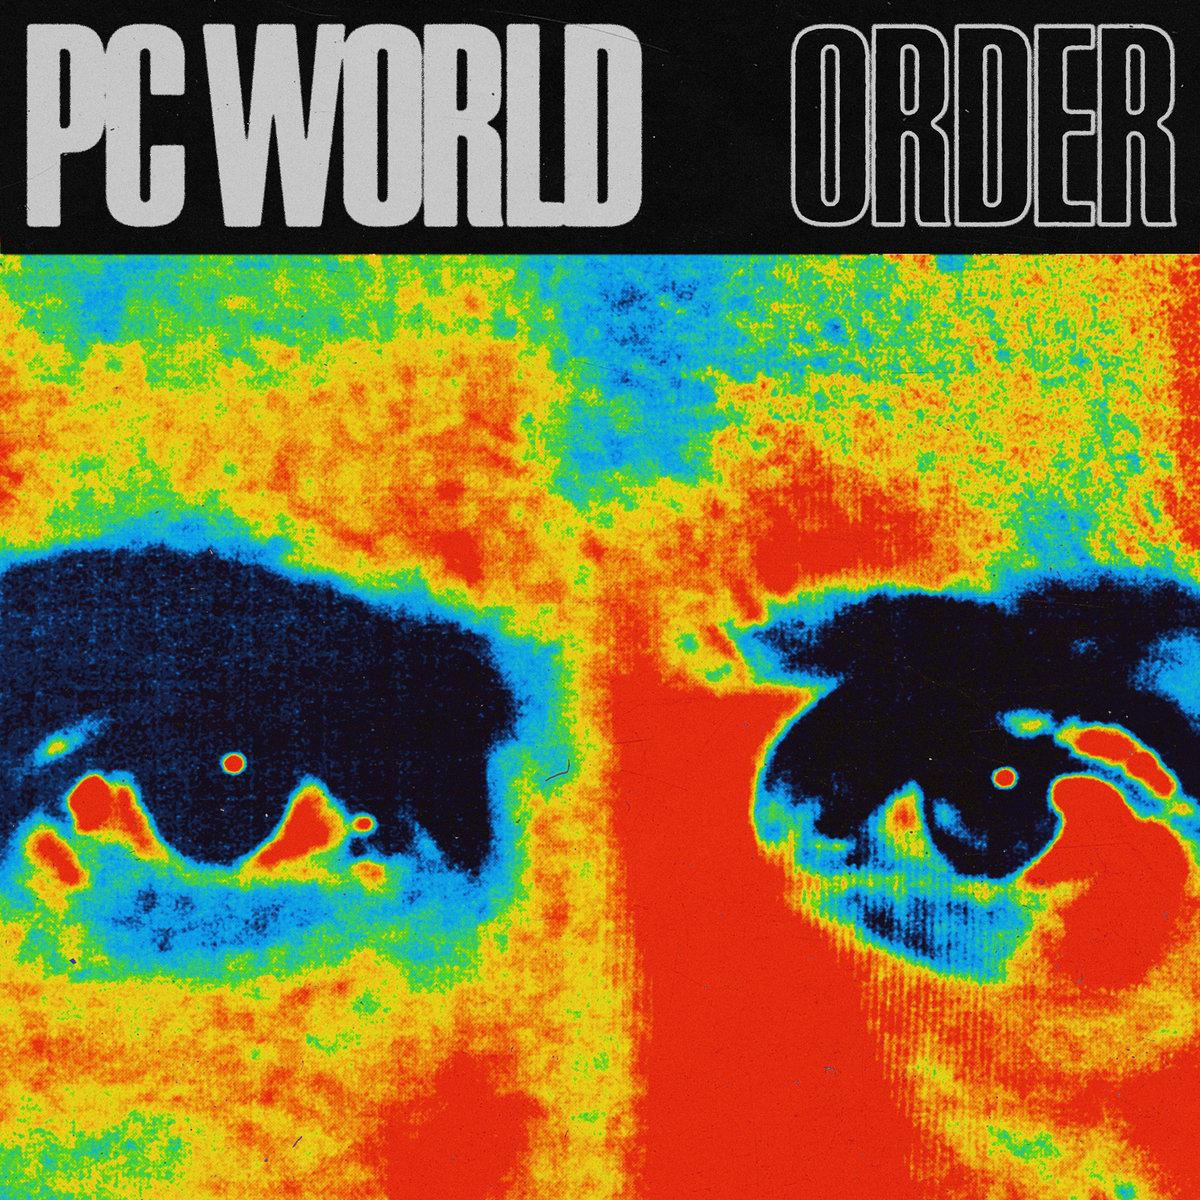 PC World - Order (EP, 2021)